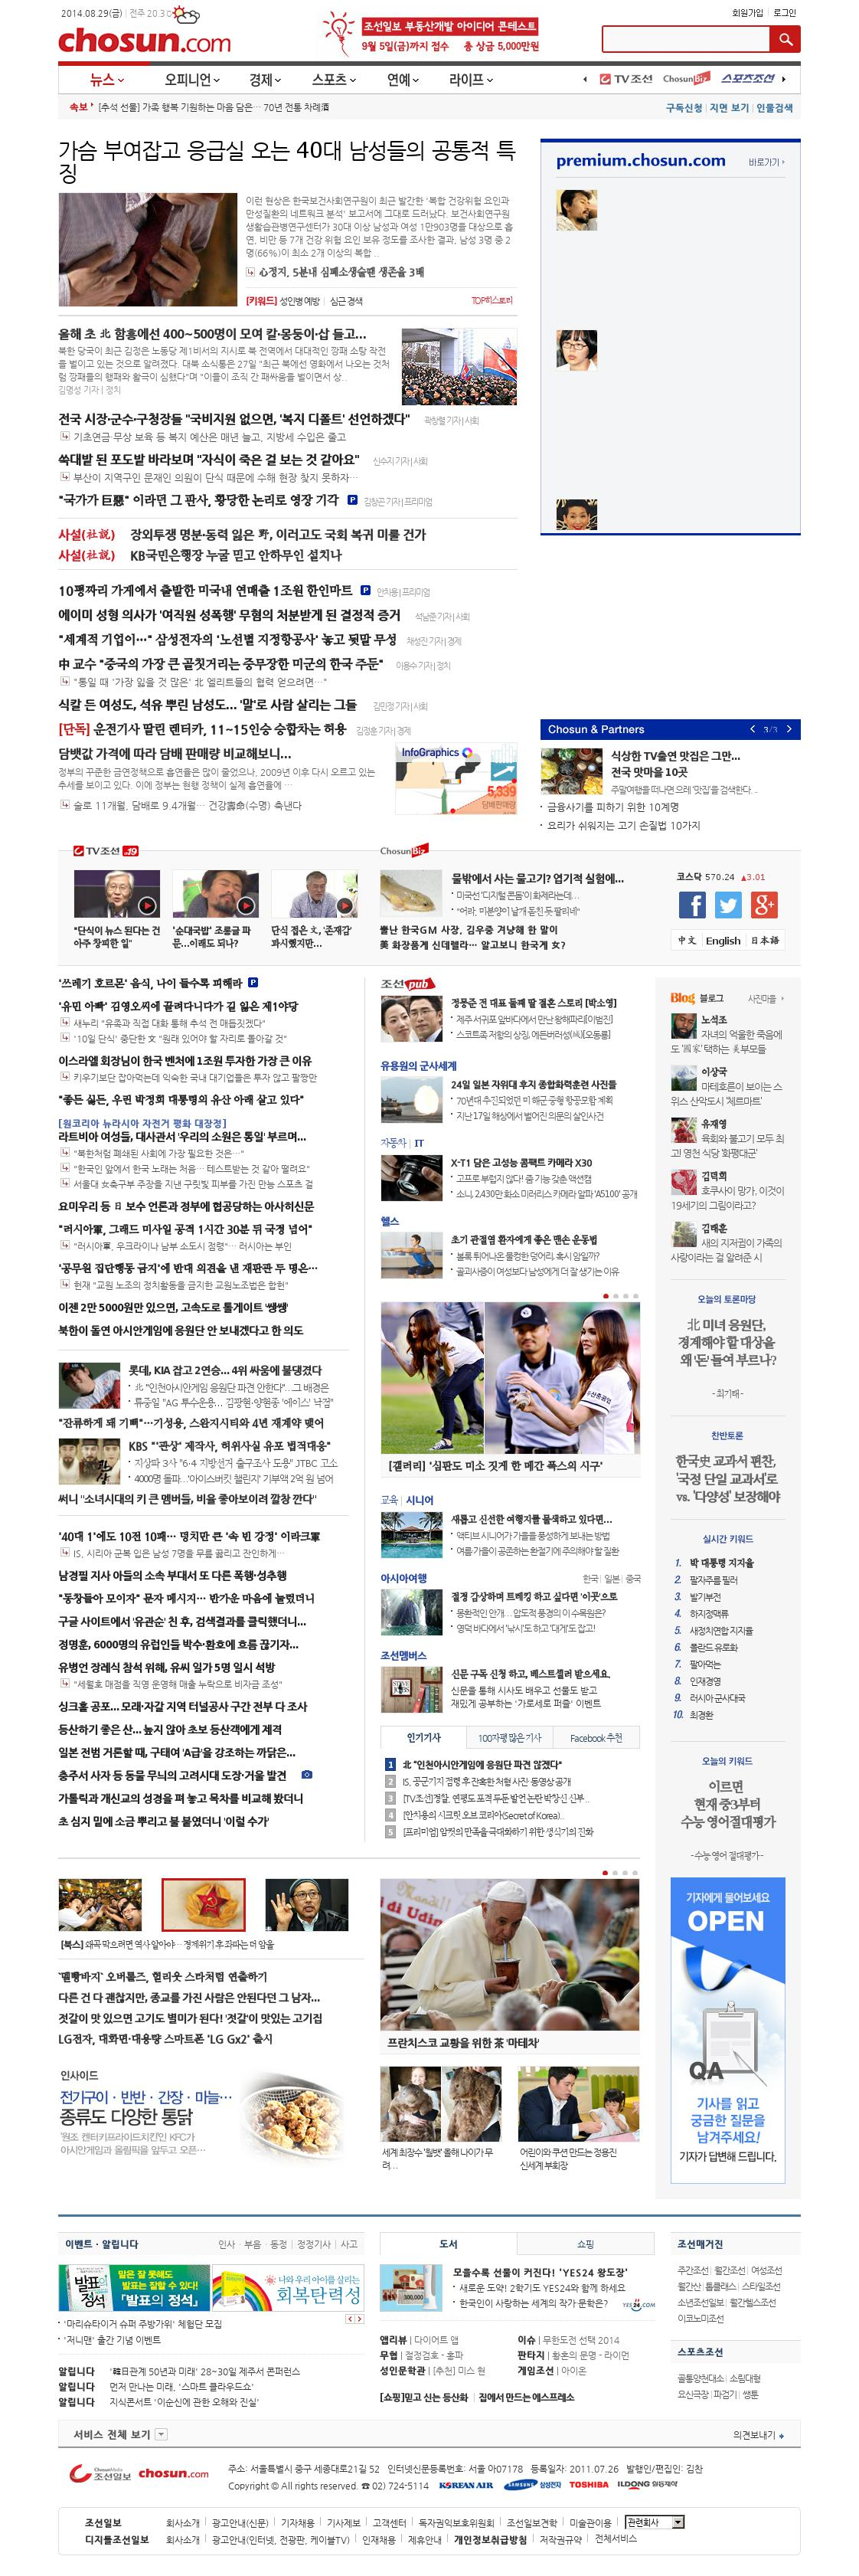 chosun.com at Thursday Aug. 28, 2014, 10:02 p.m. UTC